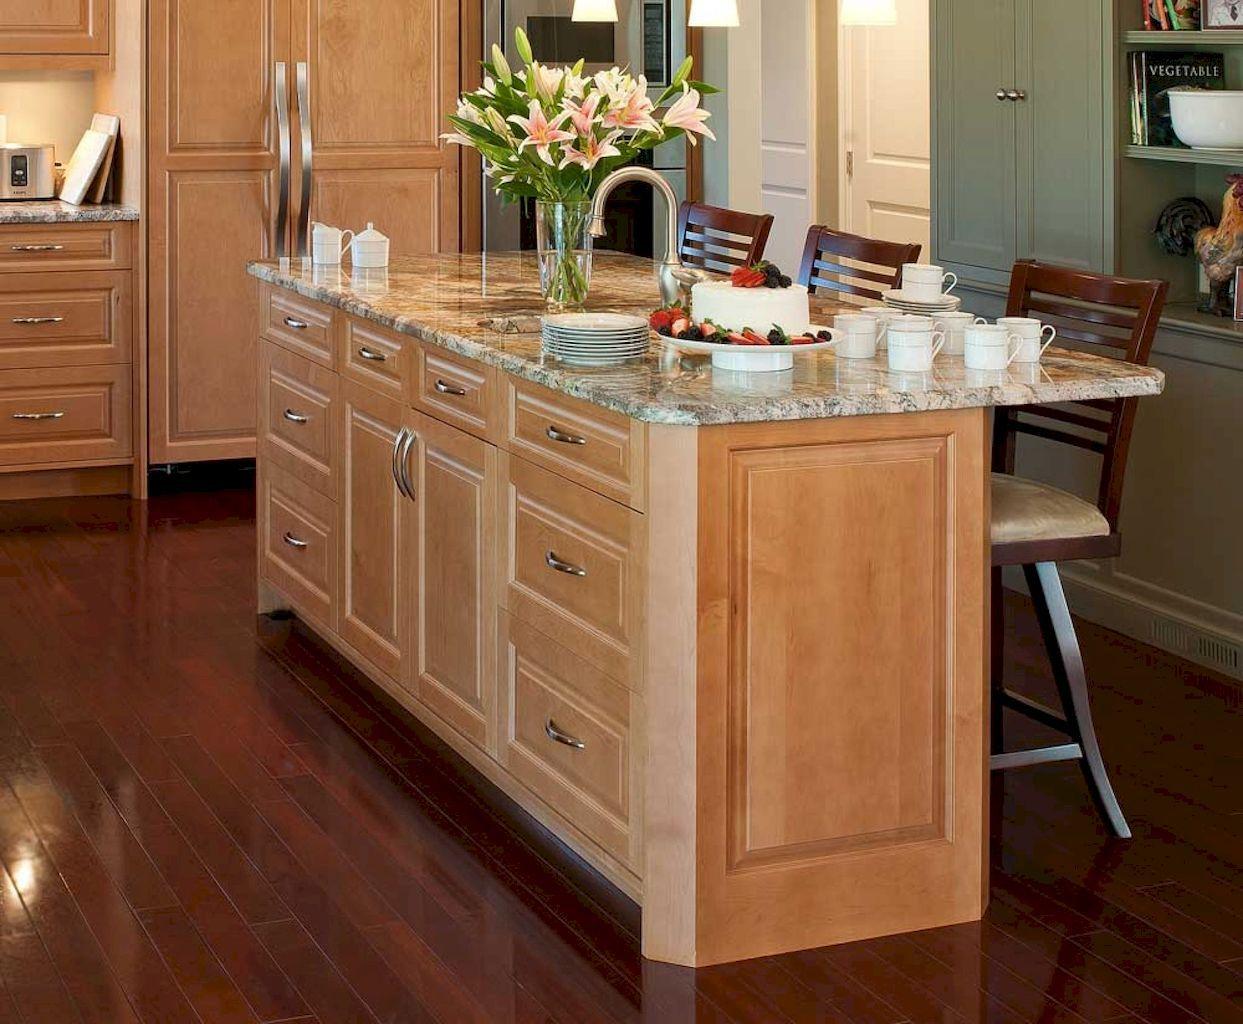 69 Stunning Kitchen Island Design Ideas